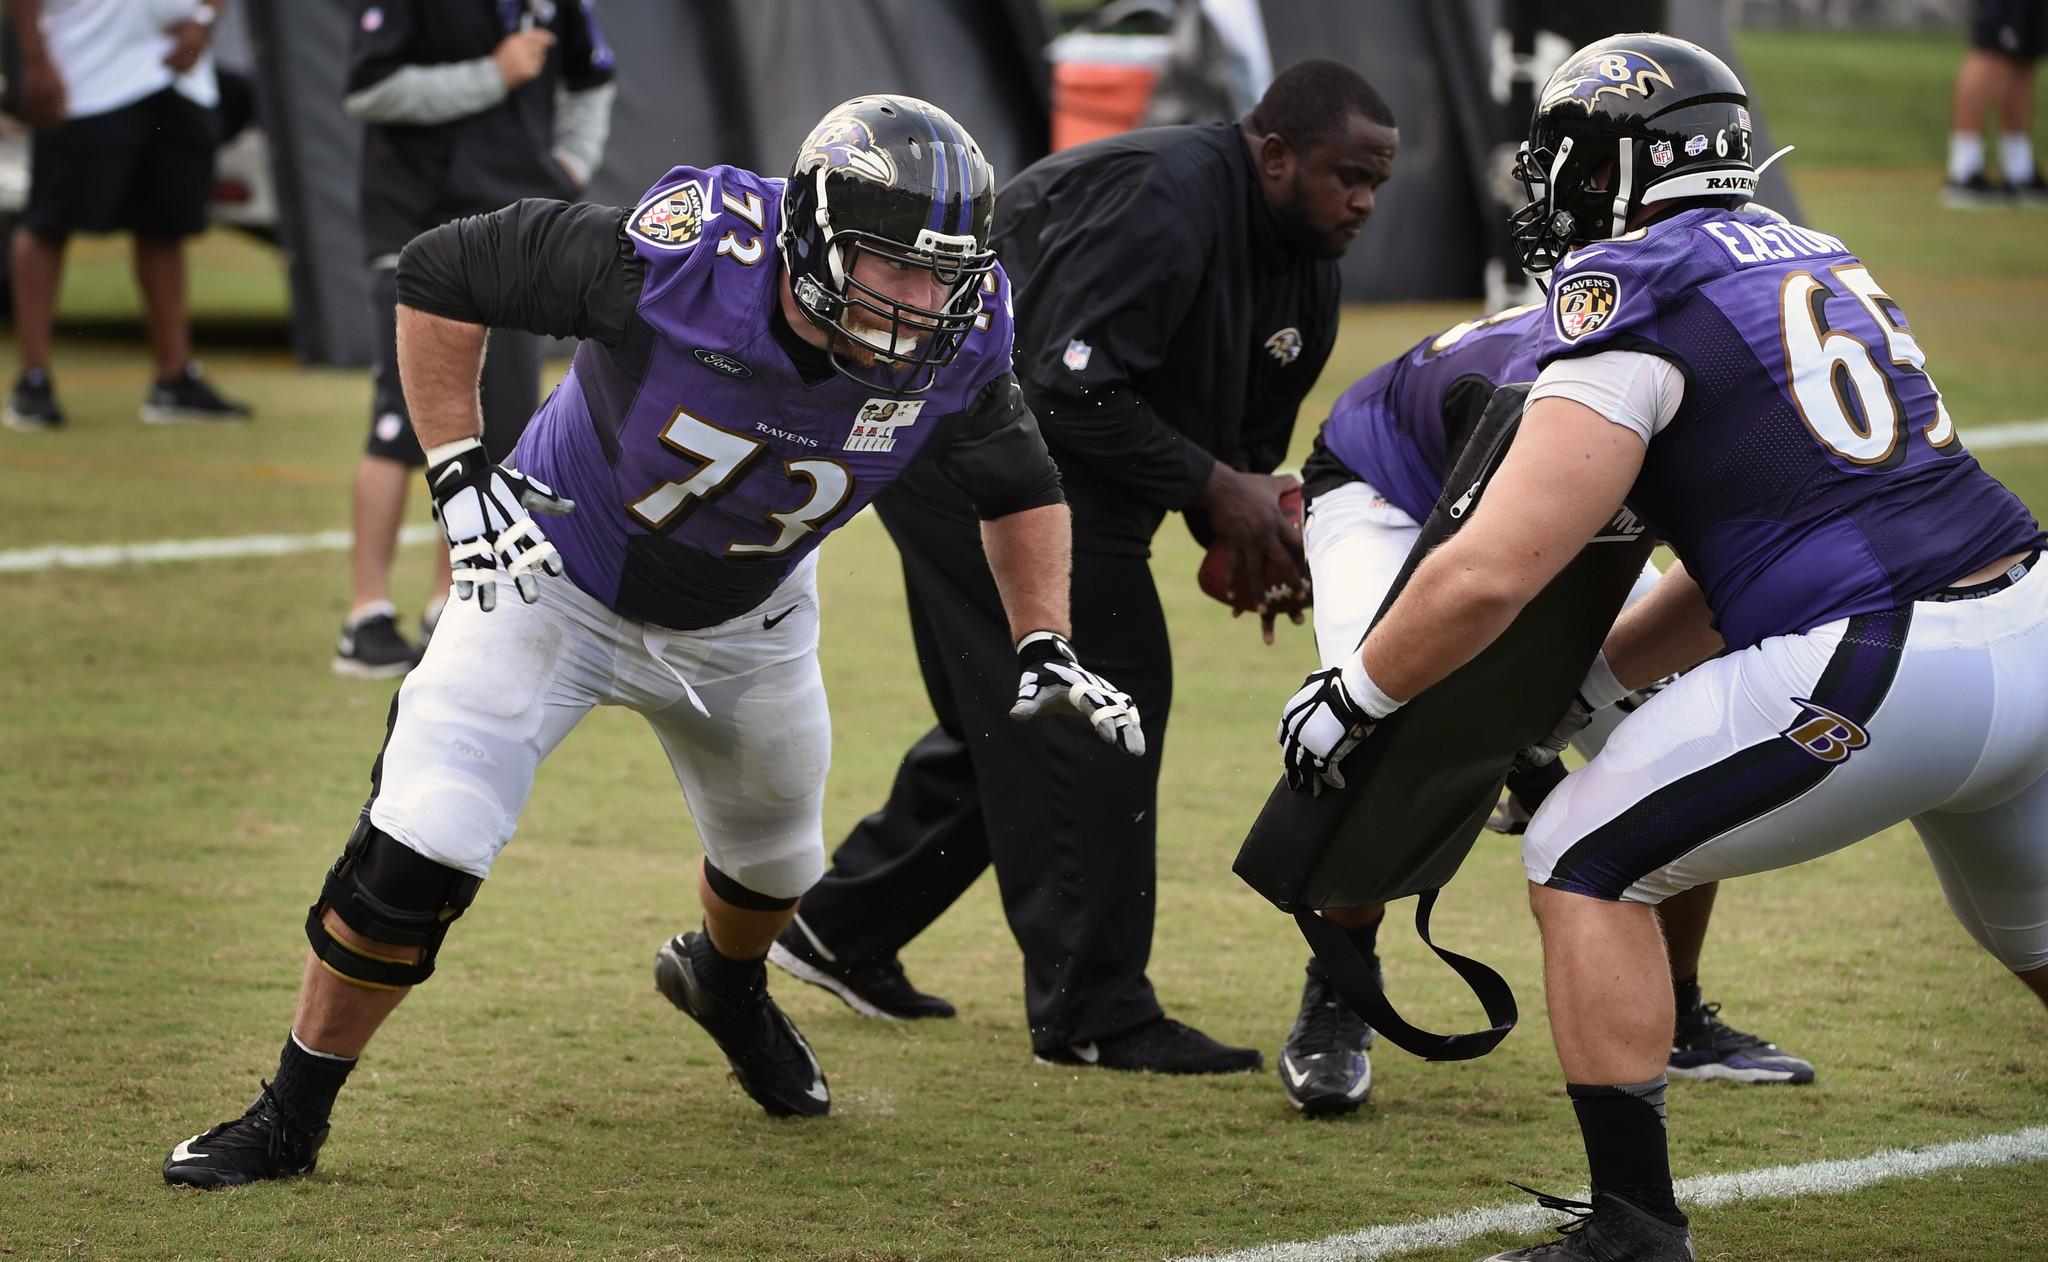 Ravens Pro Bowl guard Marshal Yanda hits training camp ac panied